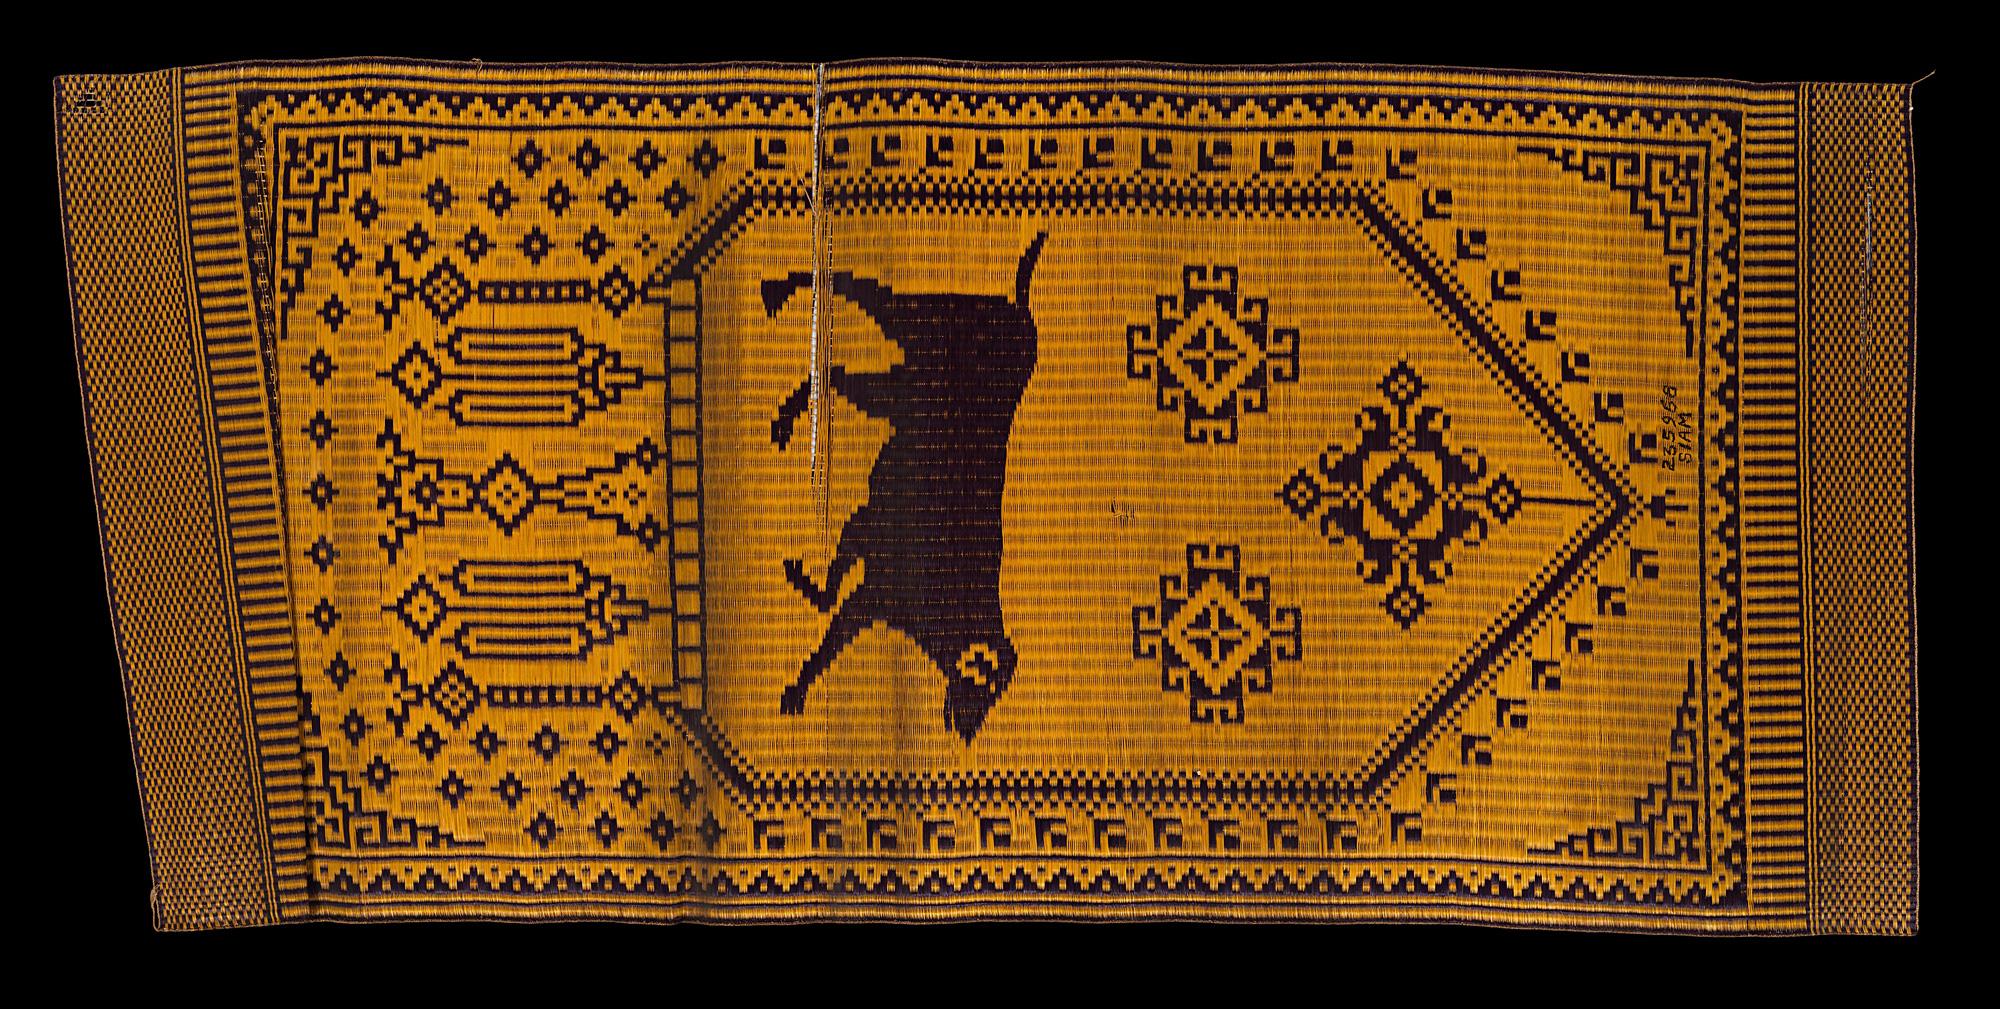 """Chantaboon"" Woven Reed Mat with Astrological Sign of the Dog Chanthaburi Province Gift from King Chulalongkorn to the Smithsonian Institution, 1904 188 x 86 cm Courtesy of the Smithsonian Institution, Department of Anthropology; E235968; Photo by Jim Di Loreto   เสื่อ ""จันทบูร"" ทอรูปสุนัข สัญลักษณ์นักษัตรปีจอ จังหวัดจันทบุรี ของขวัญพระราชทานจากพระบาทสมเด็จพระจุลจอมเกล้าเจ้าอยู่หัว แก่สถาบันสมิธโซเนียน พ.ศ. ๒๔๔๗ ๑๘๘ x ๘๖ ซม. ได้รับความอนุเคราะห์จากฝ่ายมานุษยวิทยา สถาบันสมิธโซเนียน ; E235968; ถ่ายโดยจิม ดิลอเรโต"